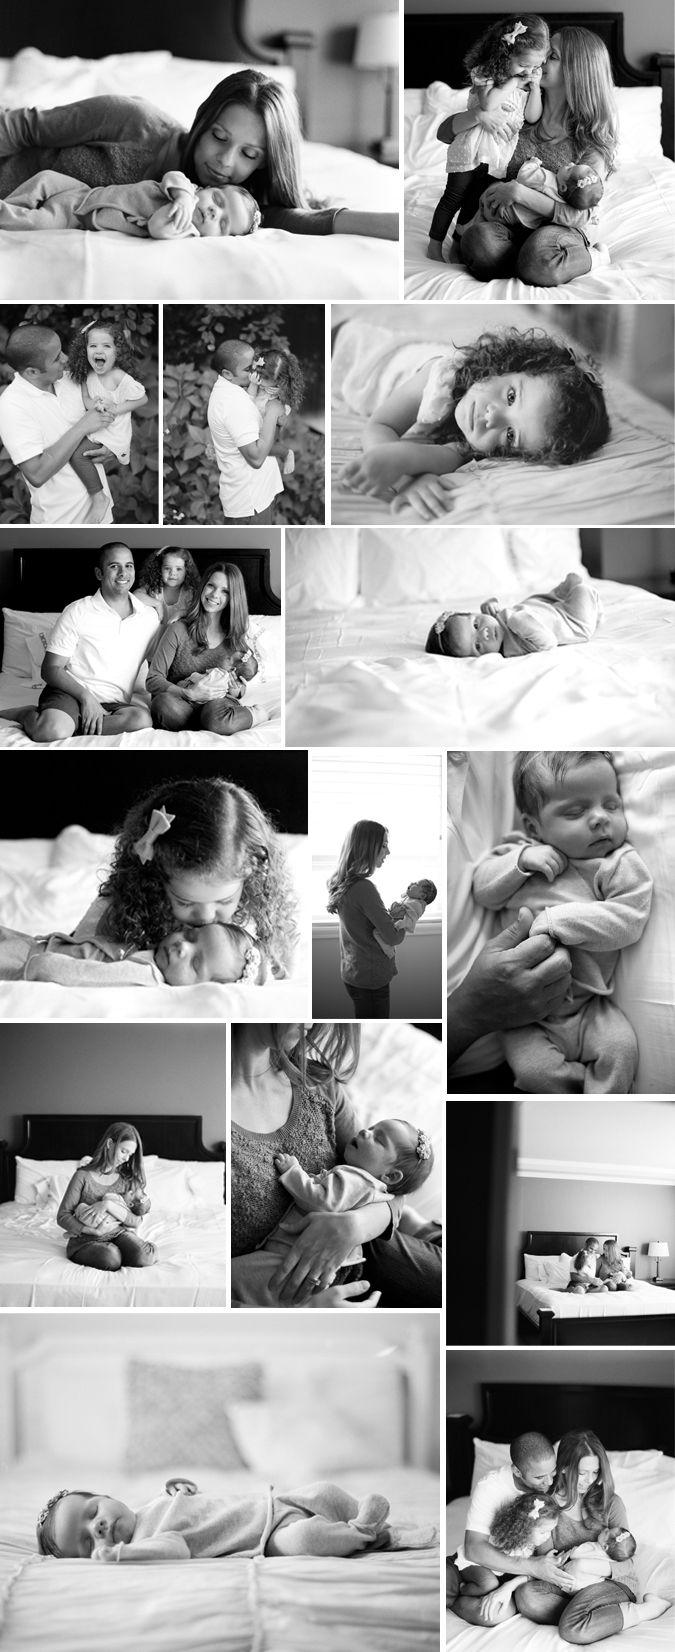 : Newborns Photo, Newborns Pictures, Families Photo, Newborn Baby Photos, New Baby, Baby Photography, Photo Shoots, Cute Family Photos, Newborns Baby Photo Ideas